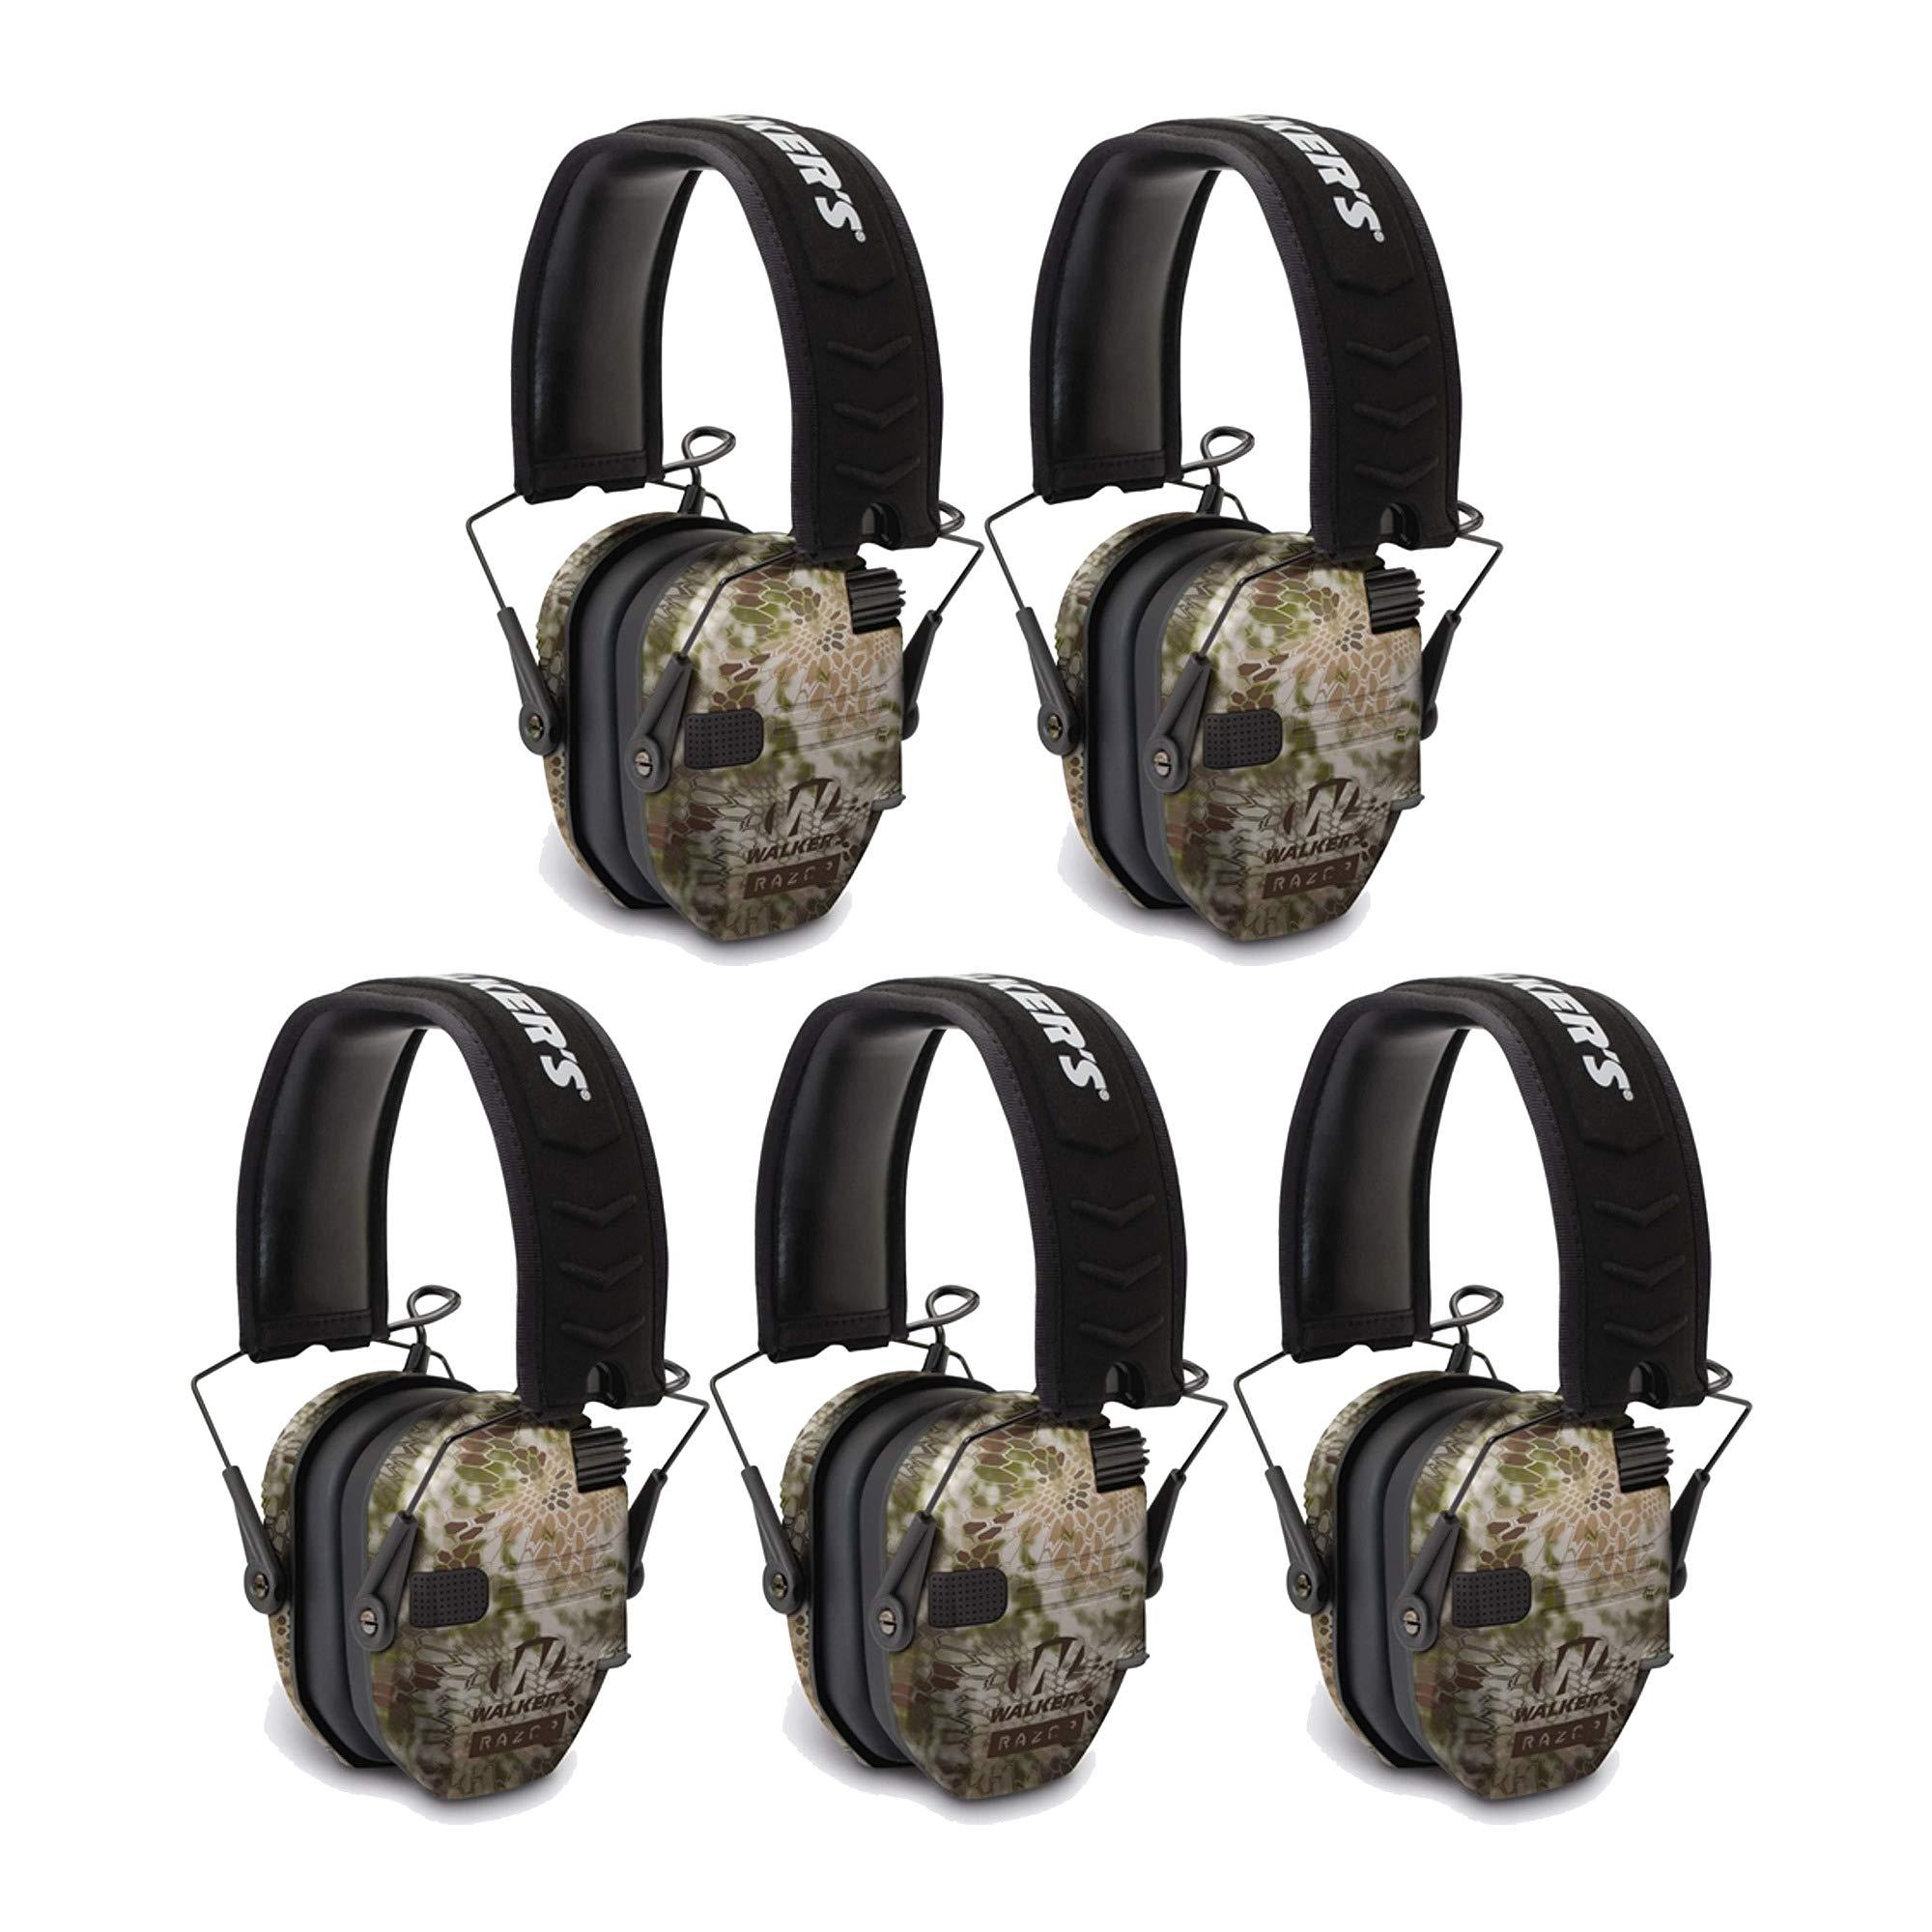 Walkers Razor Slim Electronic Shooting Ear Muff (Kryptek Camo) 5-Pack Bundle (5 Items) by Walker's Game Ear